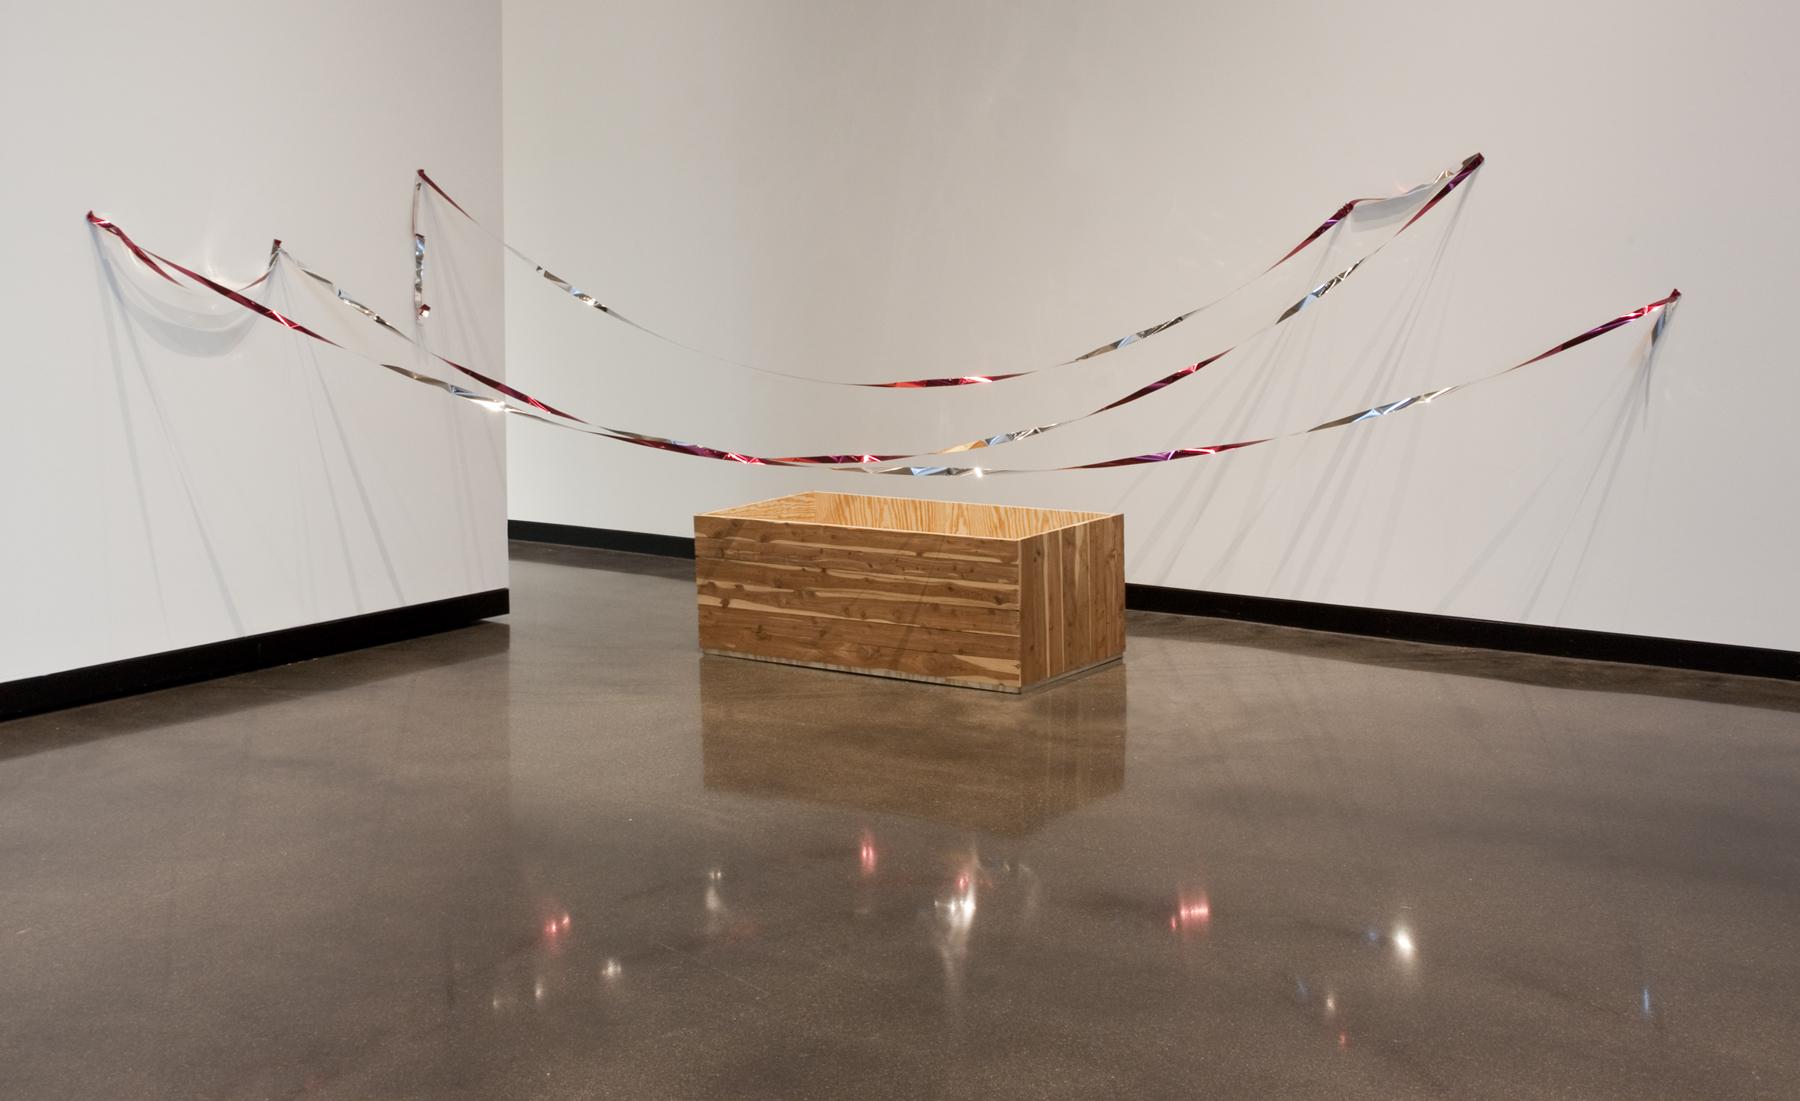 Talisman Against Endless Growth   Cedar, plywood, bird tape. 2014.